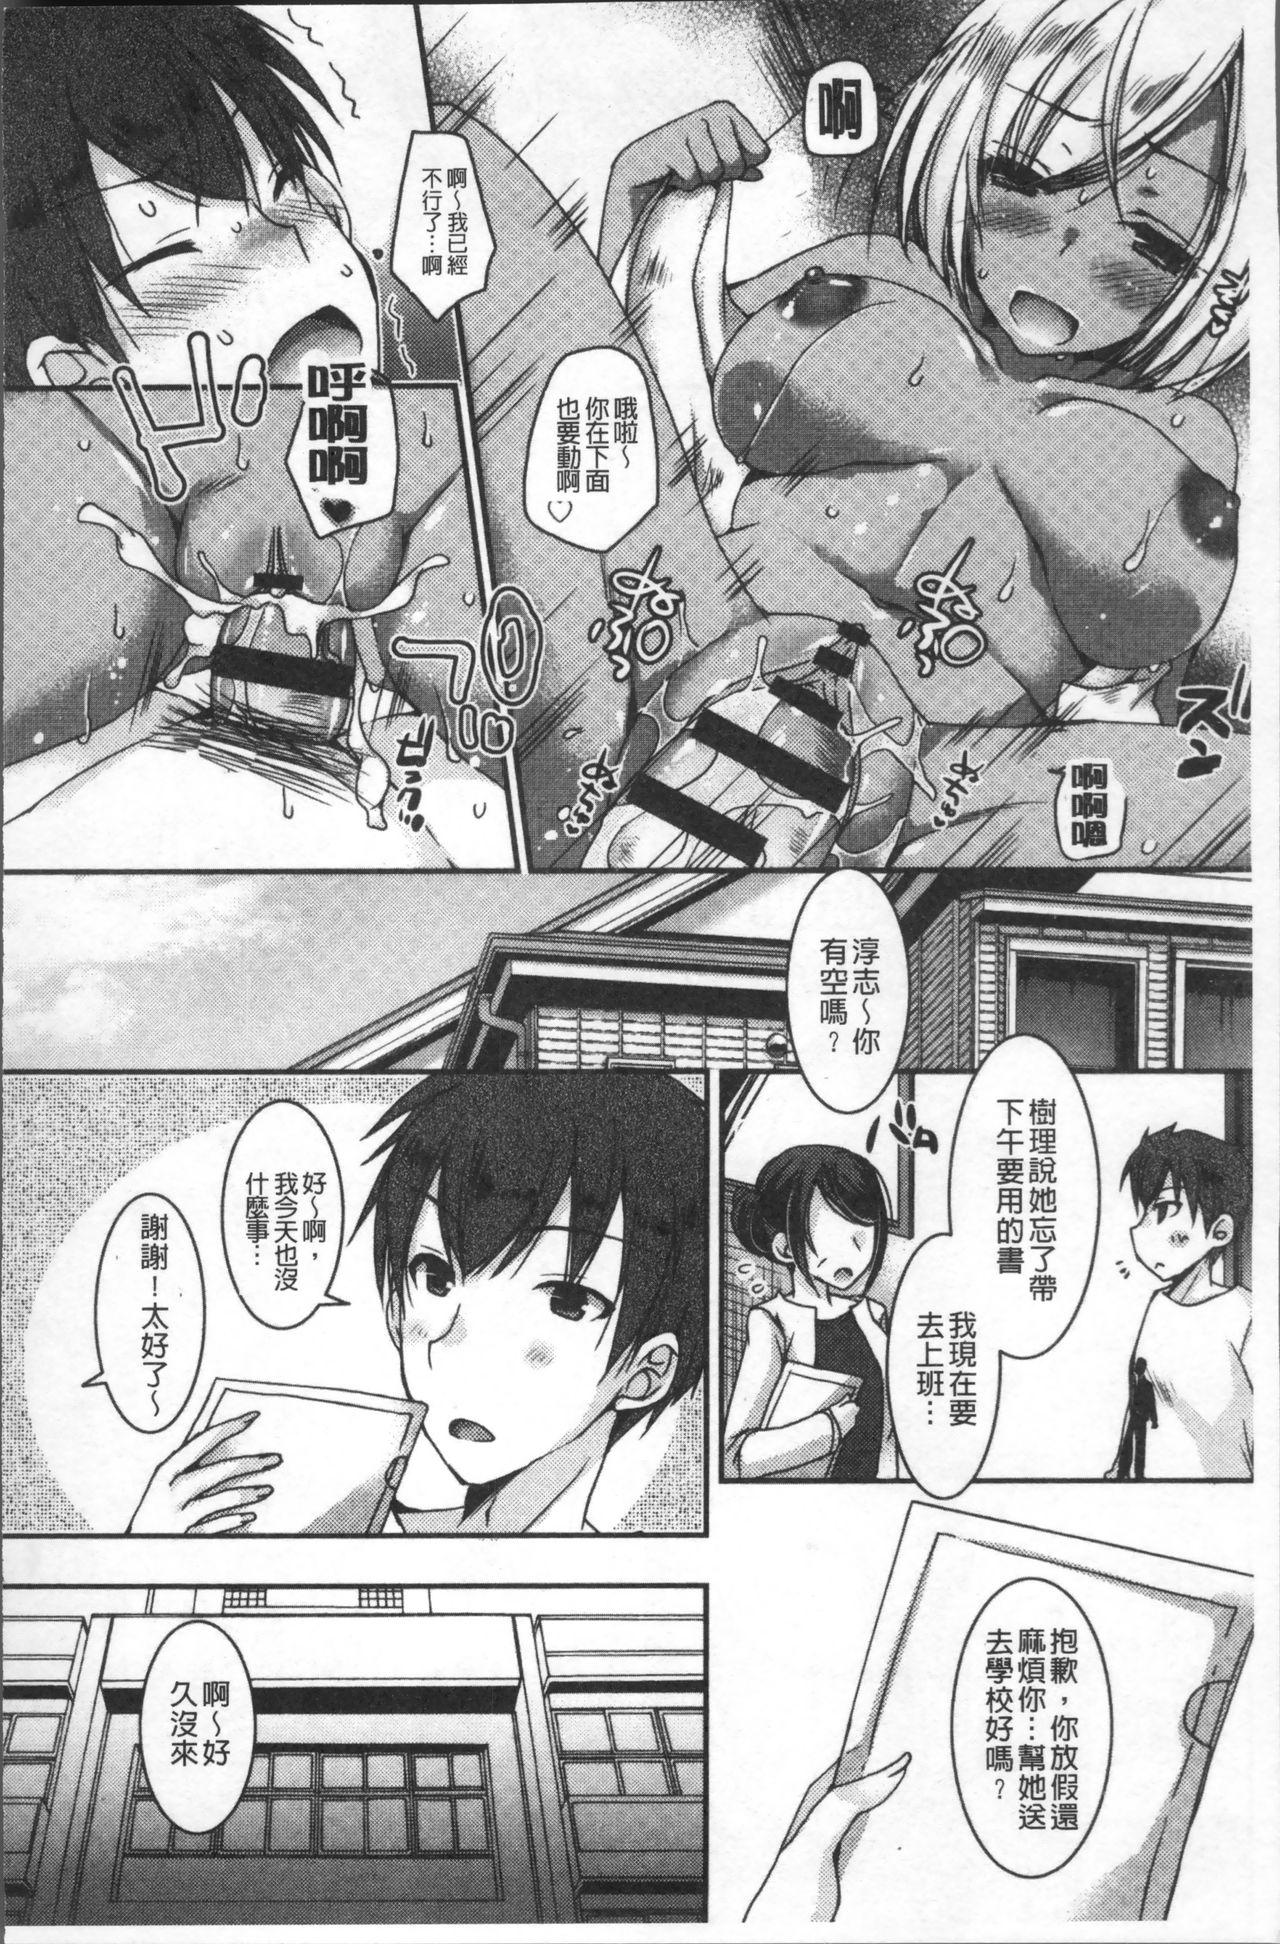 [Ueda Rieko] Doutei Killer na Imouto ~Bitch-kei Kyonyuu Gal ni Yarare Houdai~ | 童貞殺手的妹妹~被淫女系巨乳小辣妹給玩弄個過癮~ [Chinese] 75